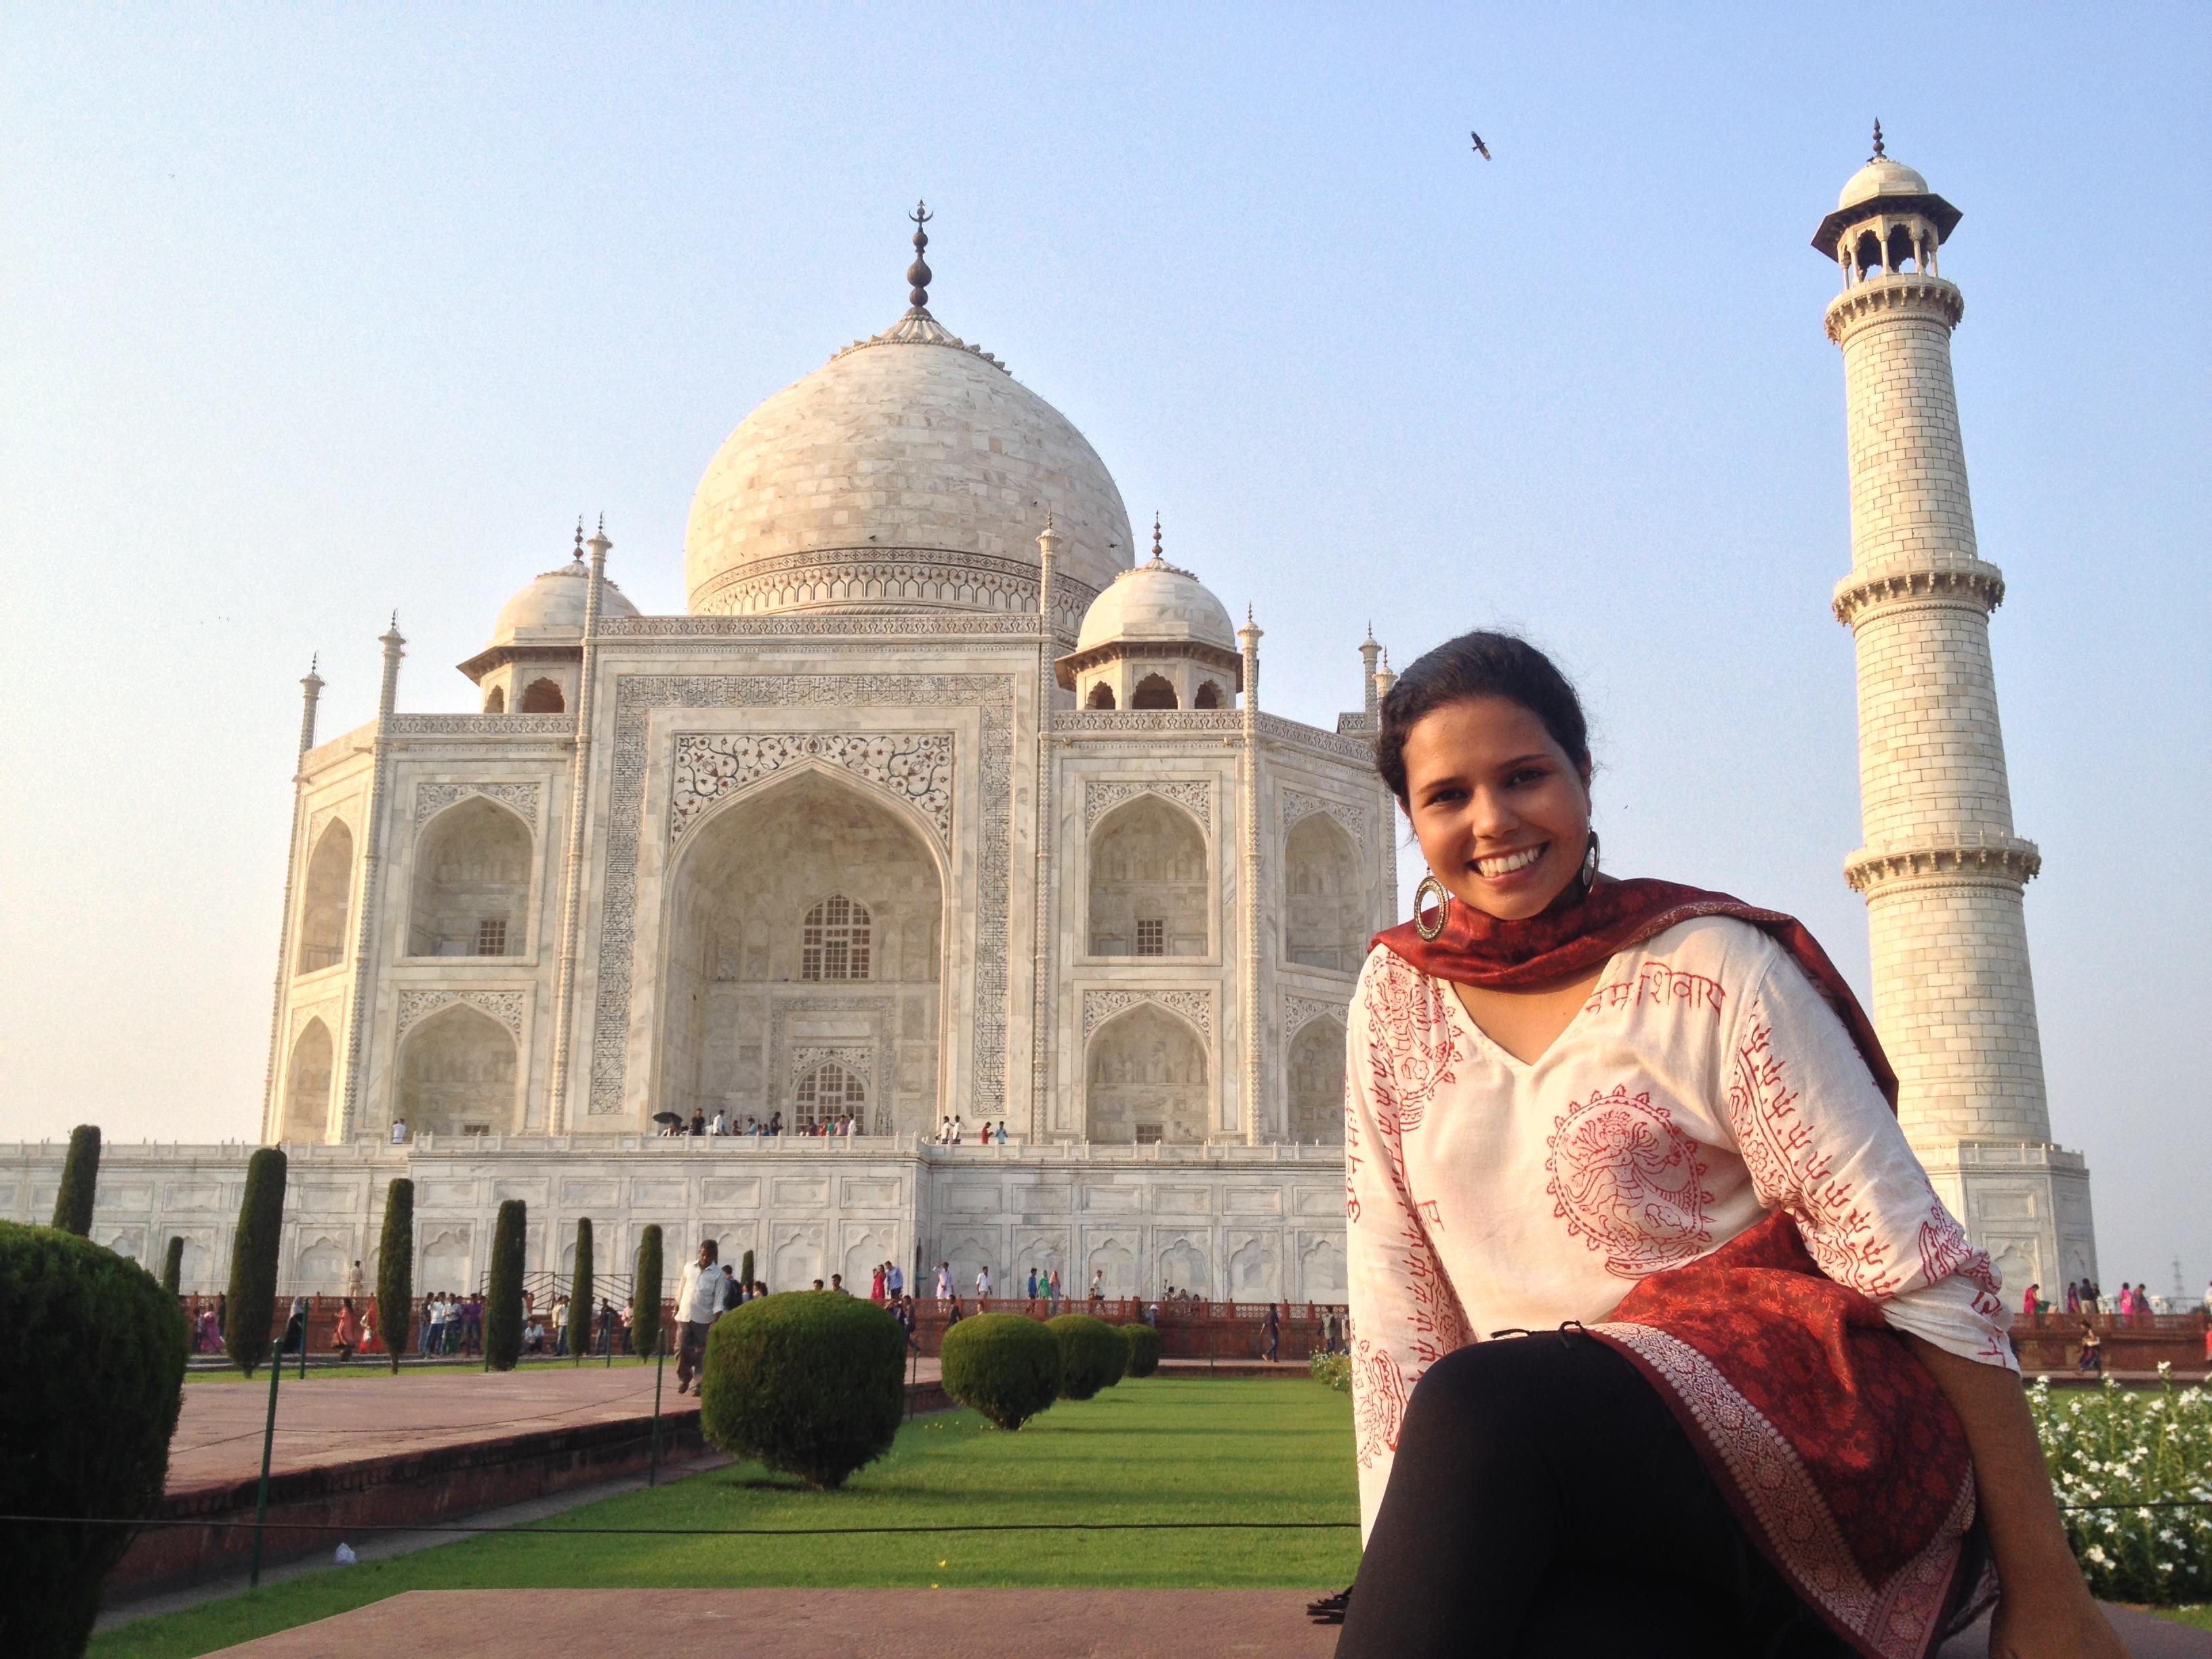 Coisas sobre a Índia